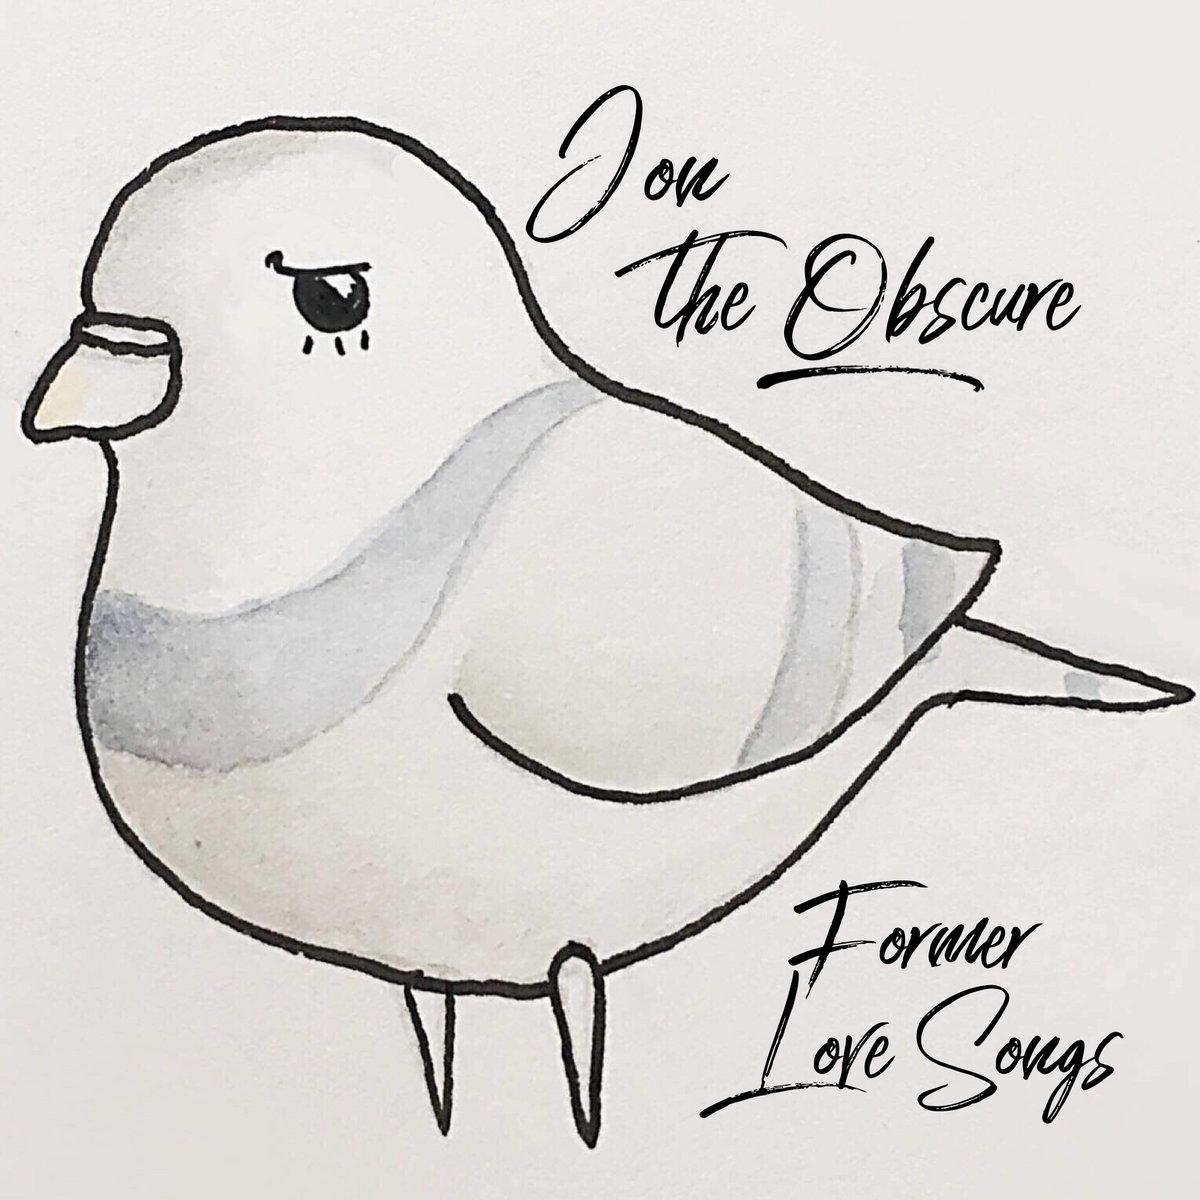 Former Love Songs Jon The Obscure